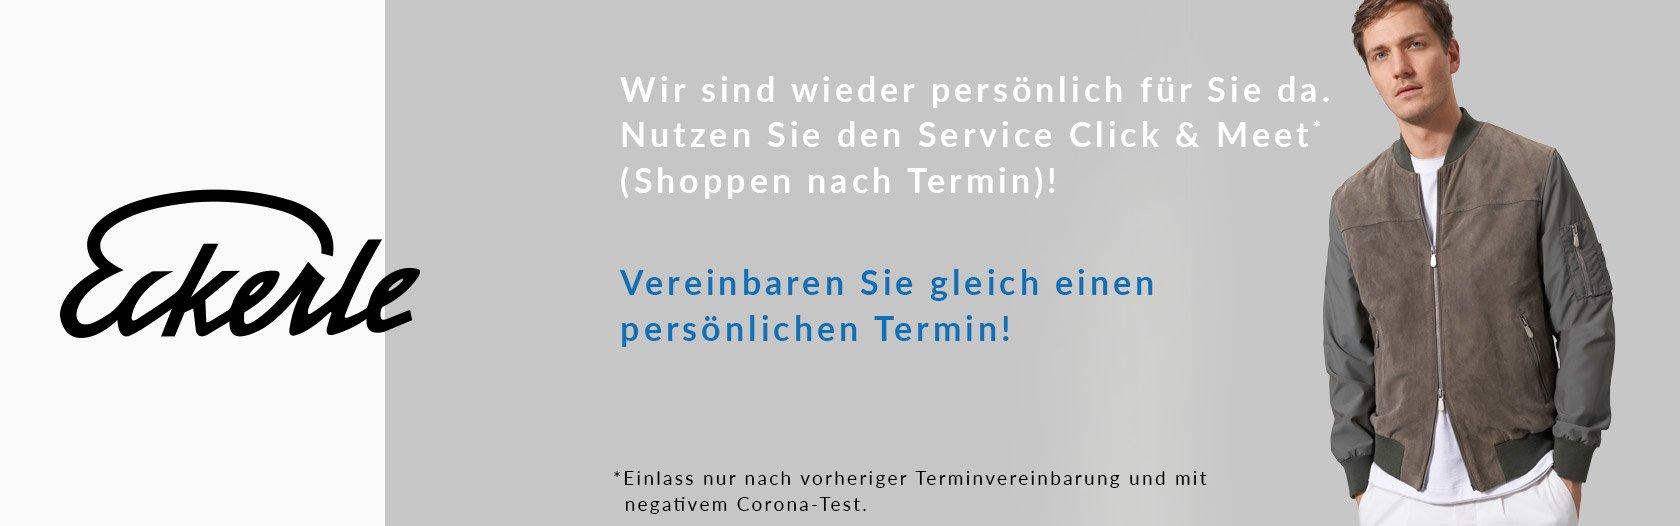 2a4eaad68513 Exklusive Herrenmode in Frankfurt | Eckerle Online Shop